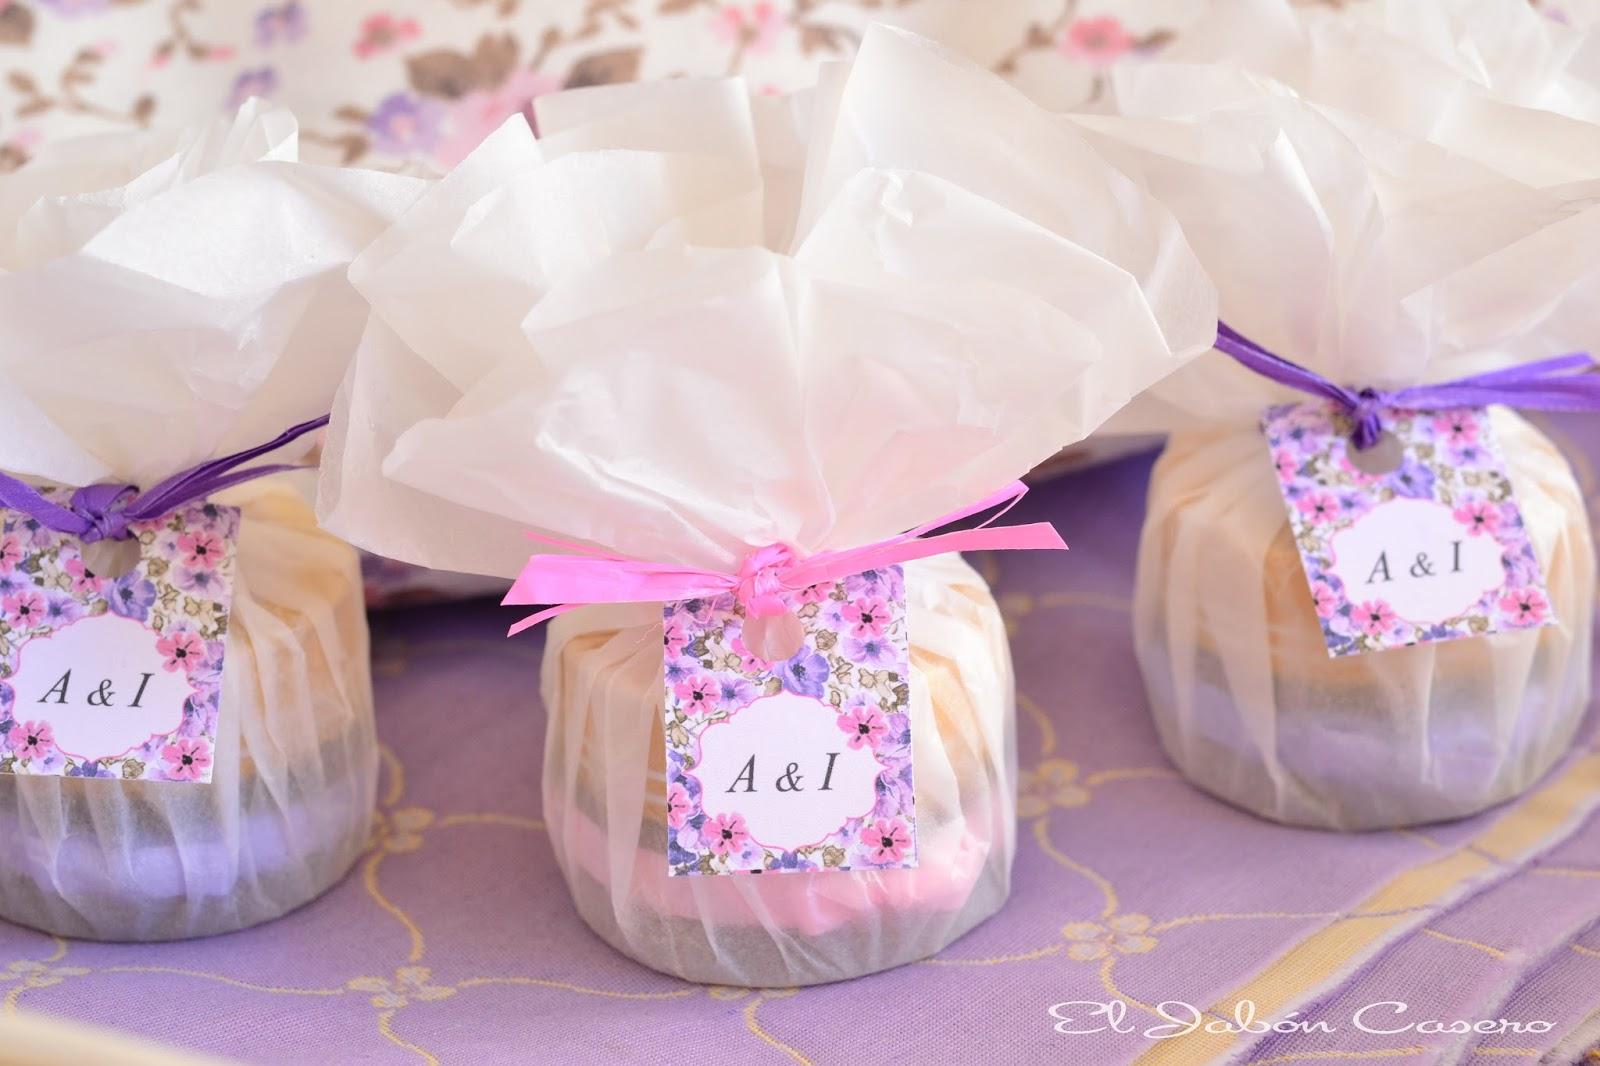 Detalles de boda bálsamos naturales artesanales